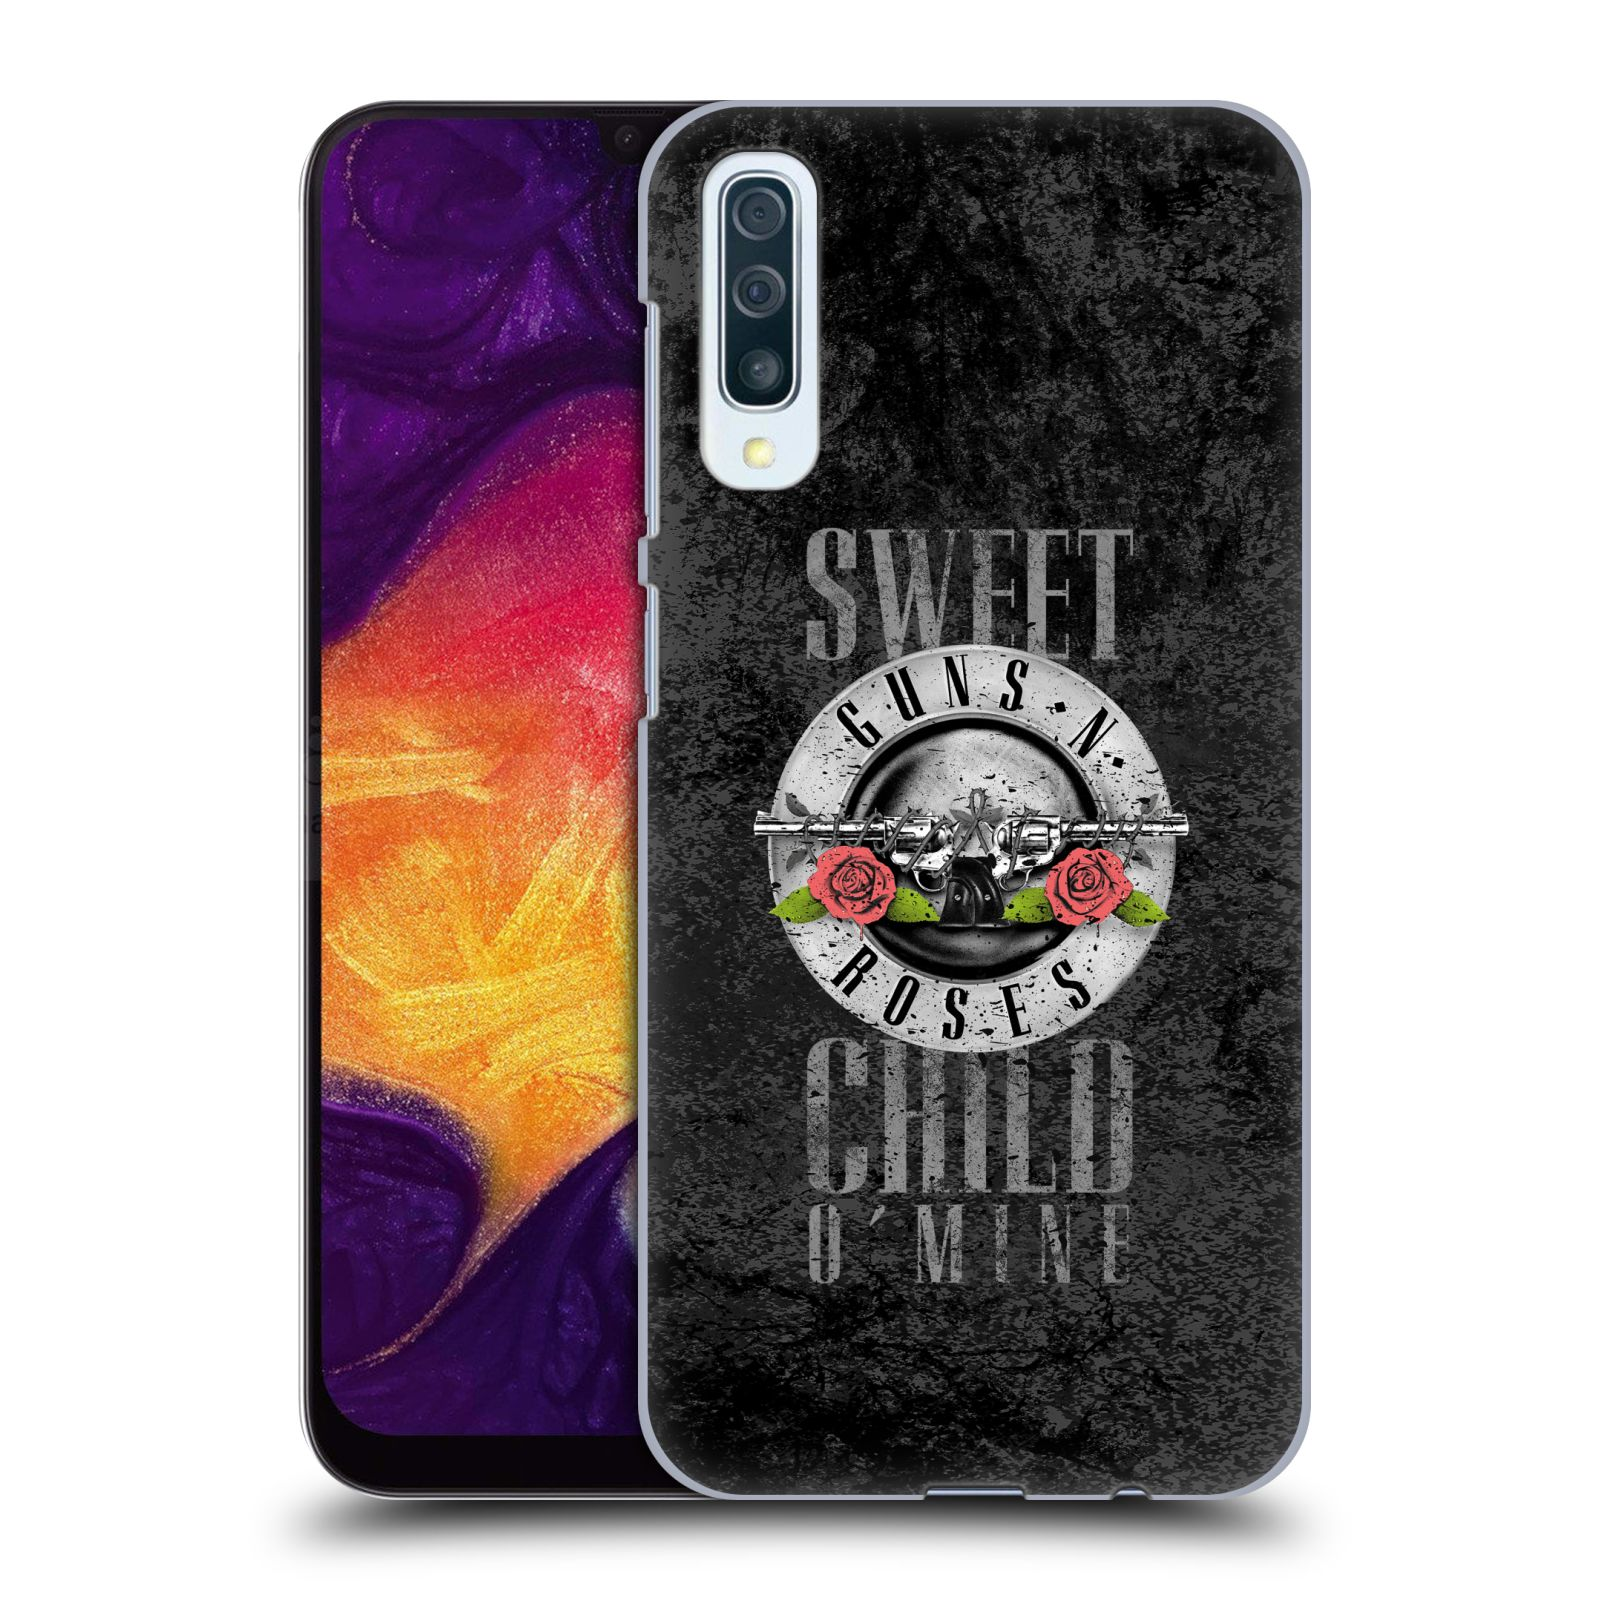 Plastové pouzdro na mobil Samsung Galaxy A50 / A30s - Head Case - Guns N' Roses - Sweet Child